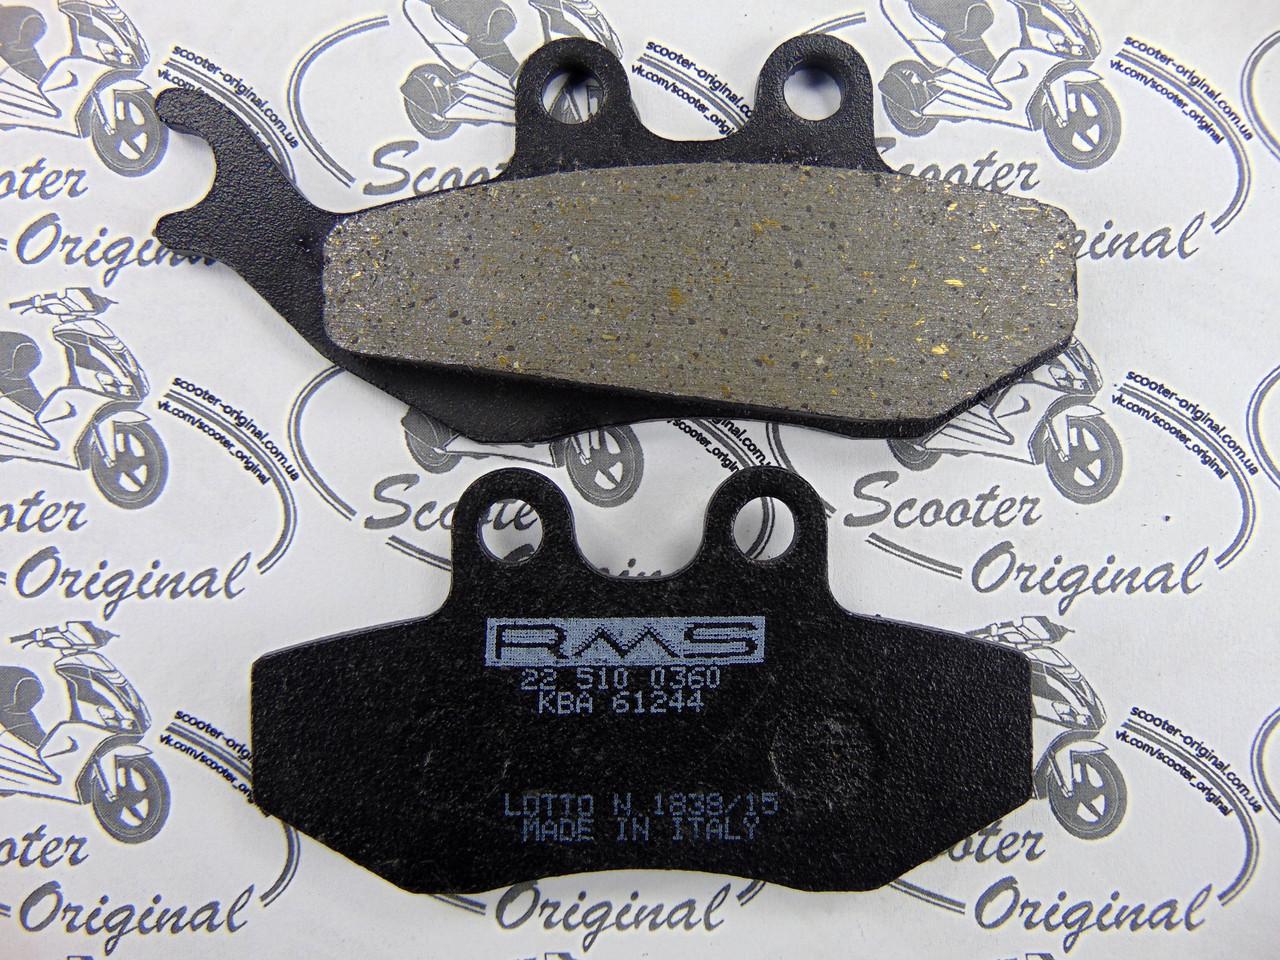 RMS (225100360) Тормозные колодки Aprilia MX, RS, RX, SX, Beta RR, Gilera Runner, DNA, Yamaha DT XT, Derbi GP1